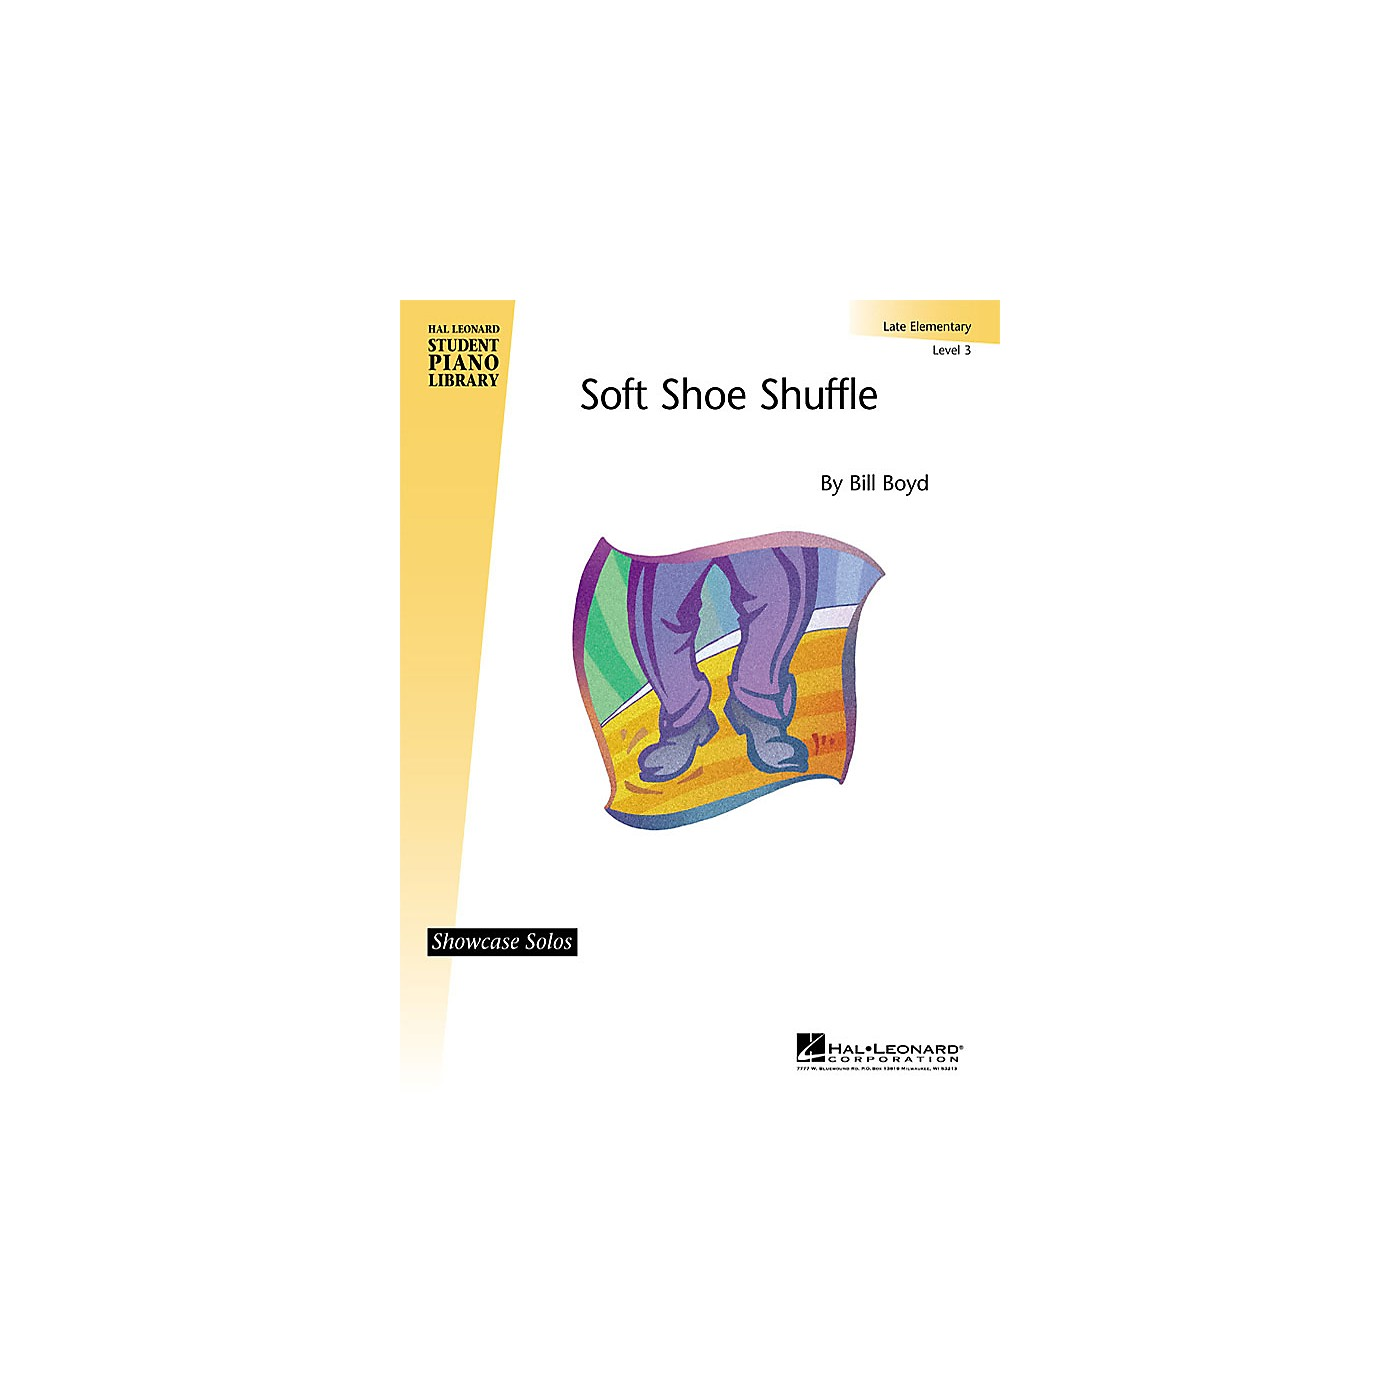 Hal Leonard Soft Shoe Shuffle (Late Elem (Level 3) Showcase Solo) Piano Library Series by Bill Boyd thumbnail